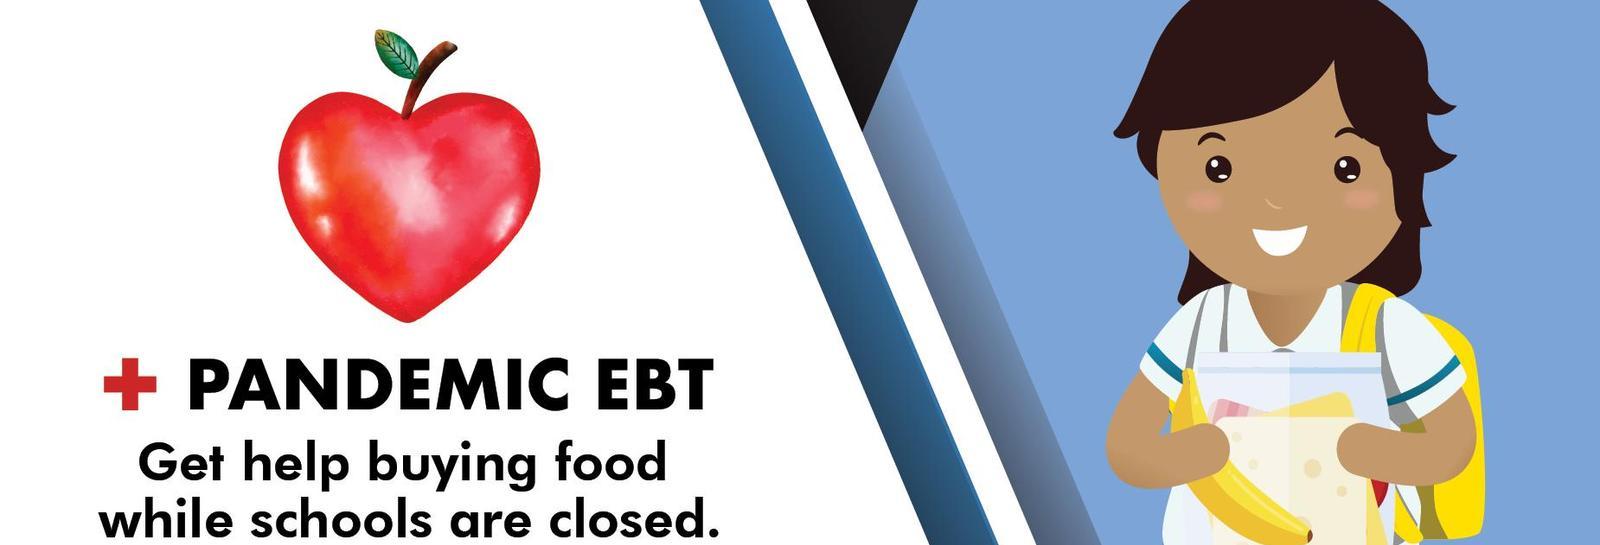 Pandemic EBT banner